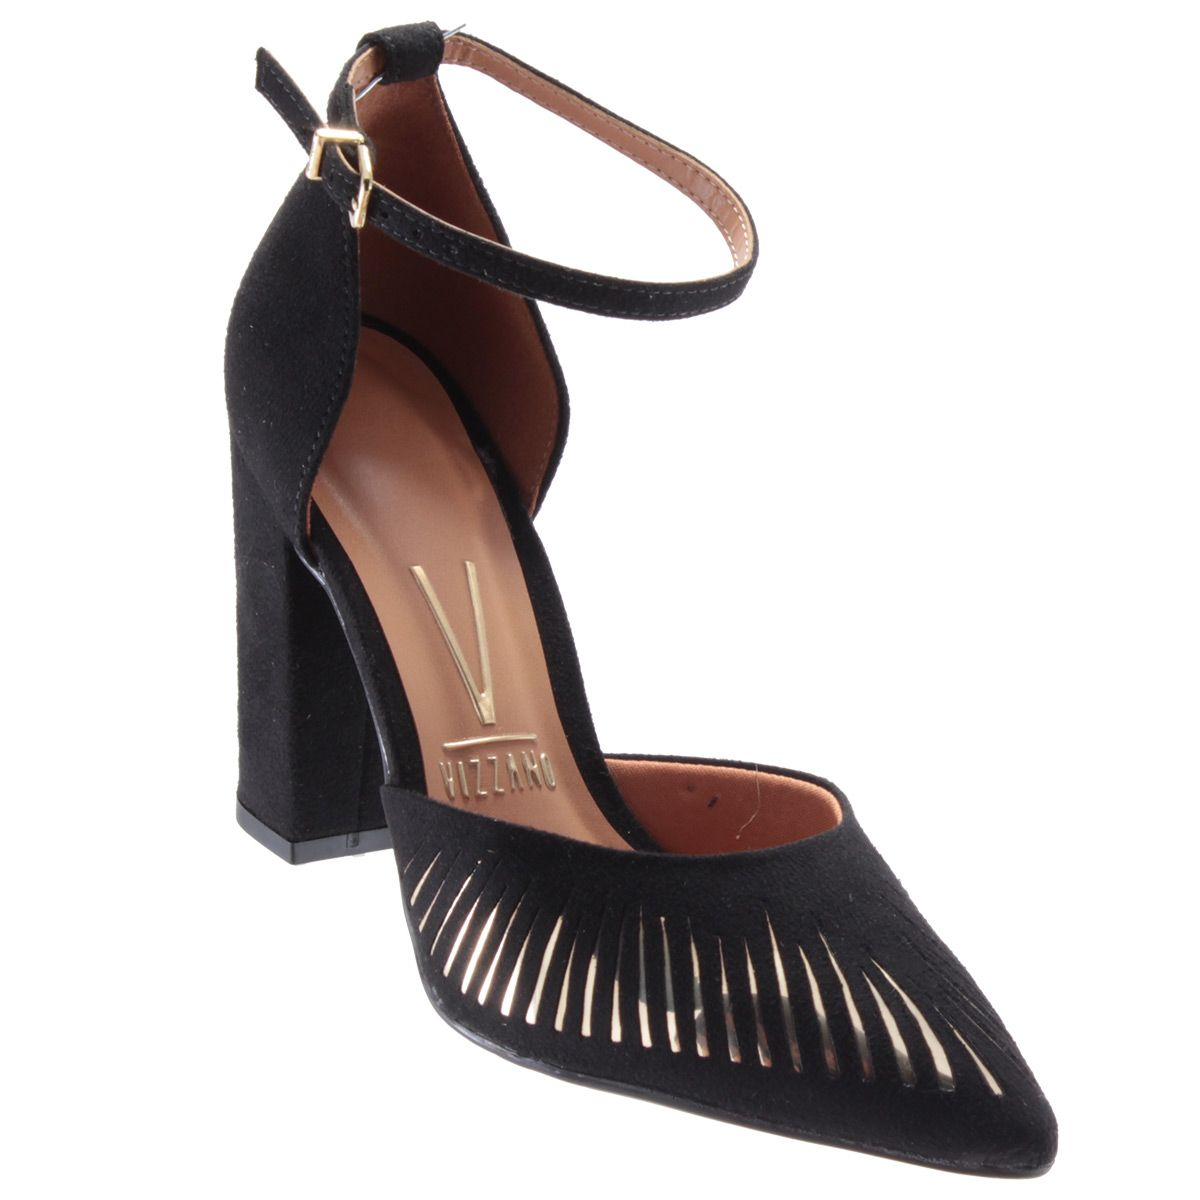 Scarpin Vizzano Sapato Feminino Salto Alto Metalizado 1264105  - Ian Calçados